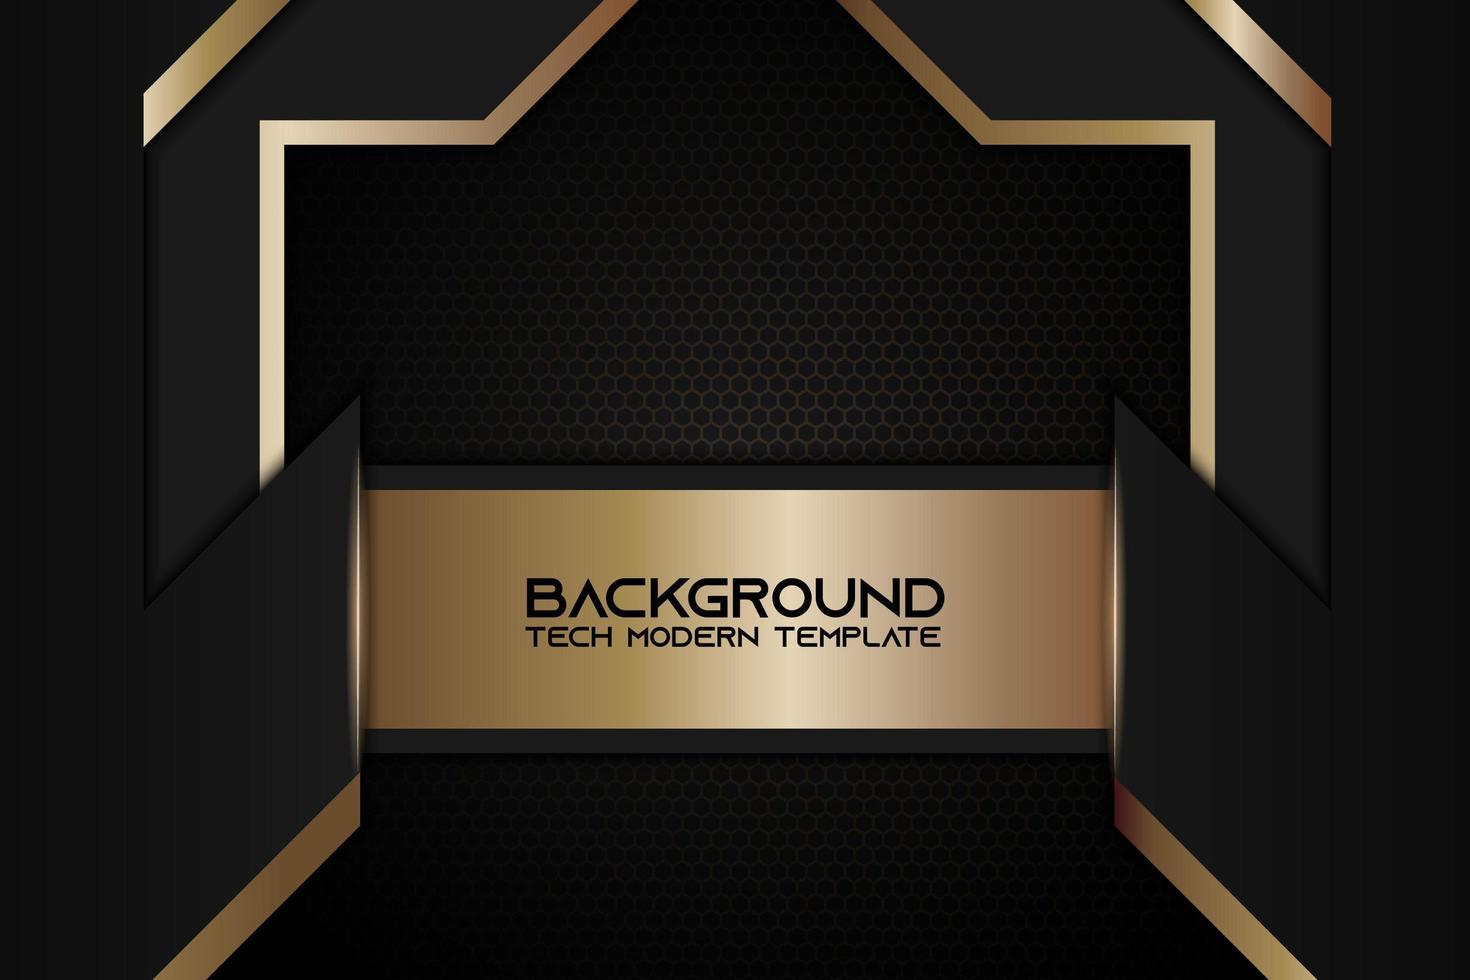 Metallic Angled Background with Golden Black Frame